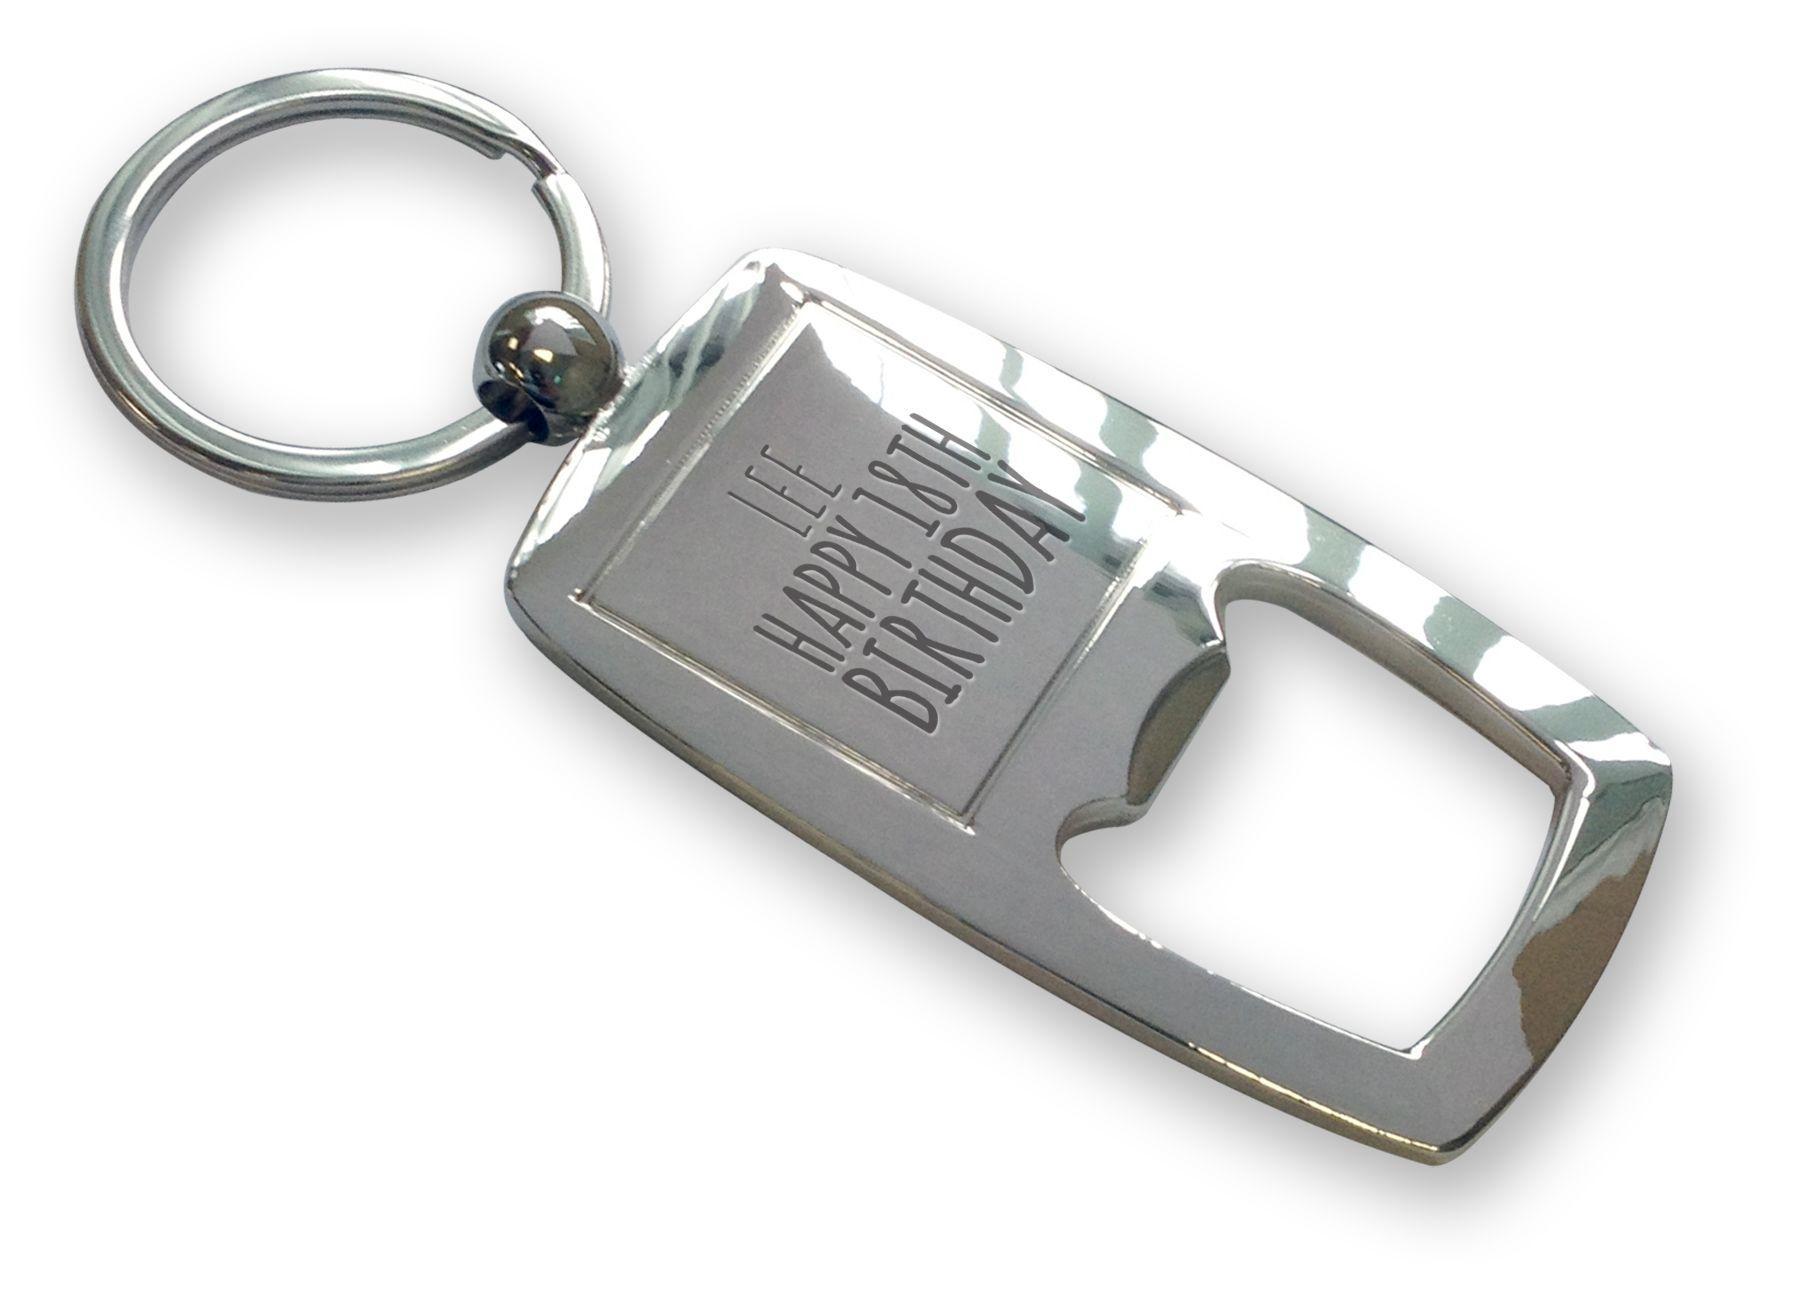 Personalised Engraved Bottle Opener Keyring//Keychain Christmas Birthday Gifts